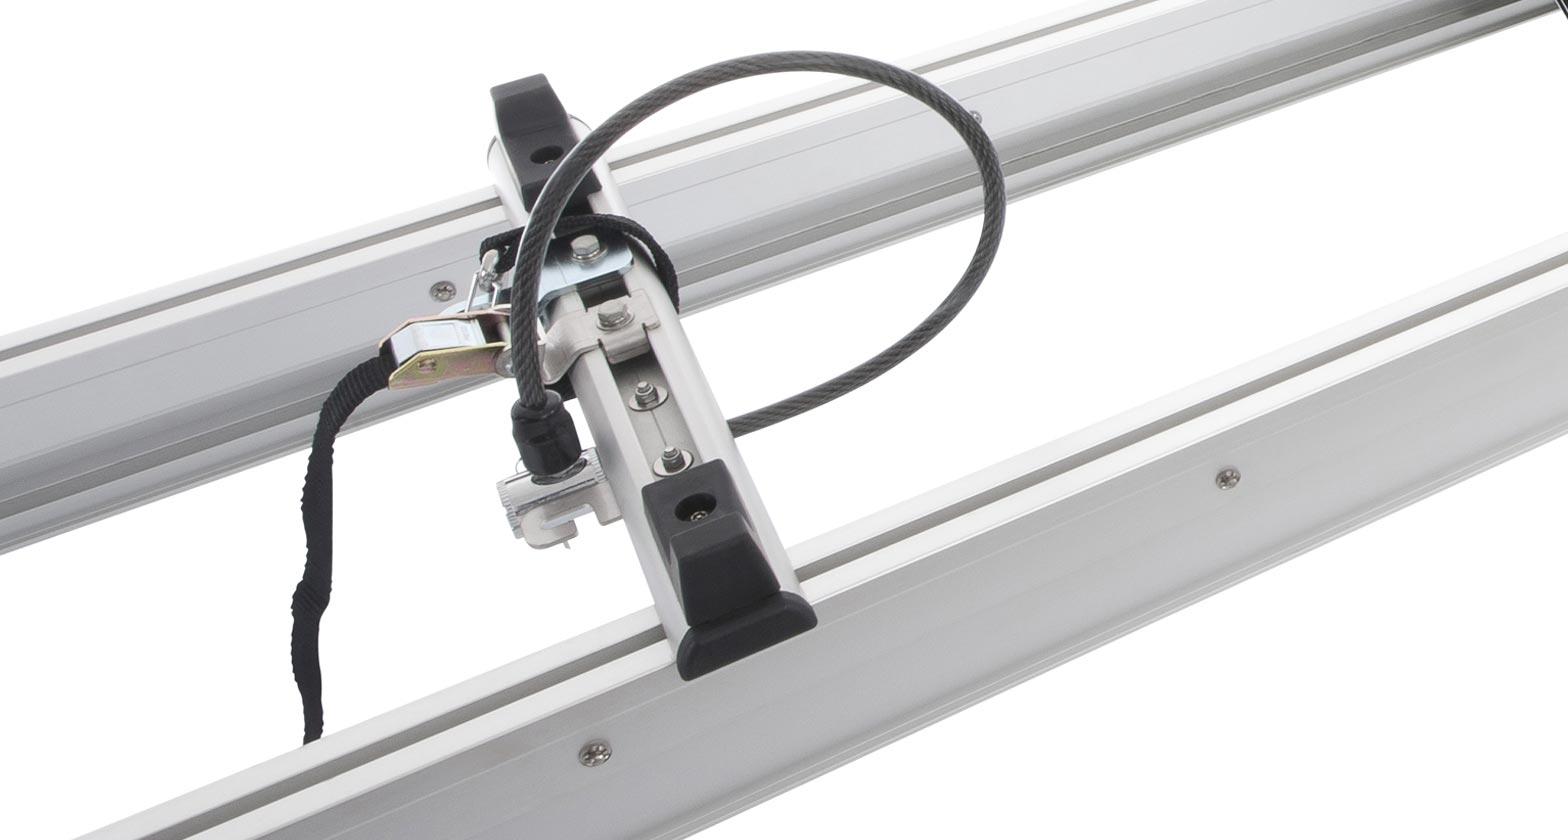 Ja0471 Ohs Extension Ladder Loader System Rhino Rack